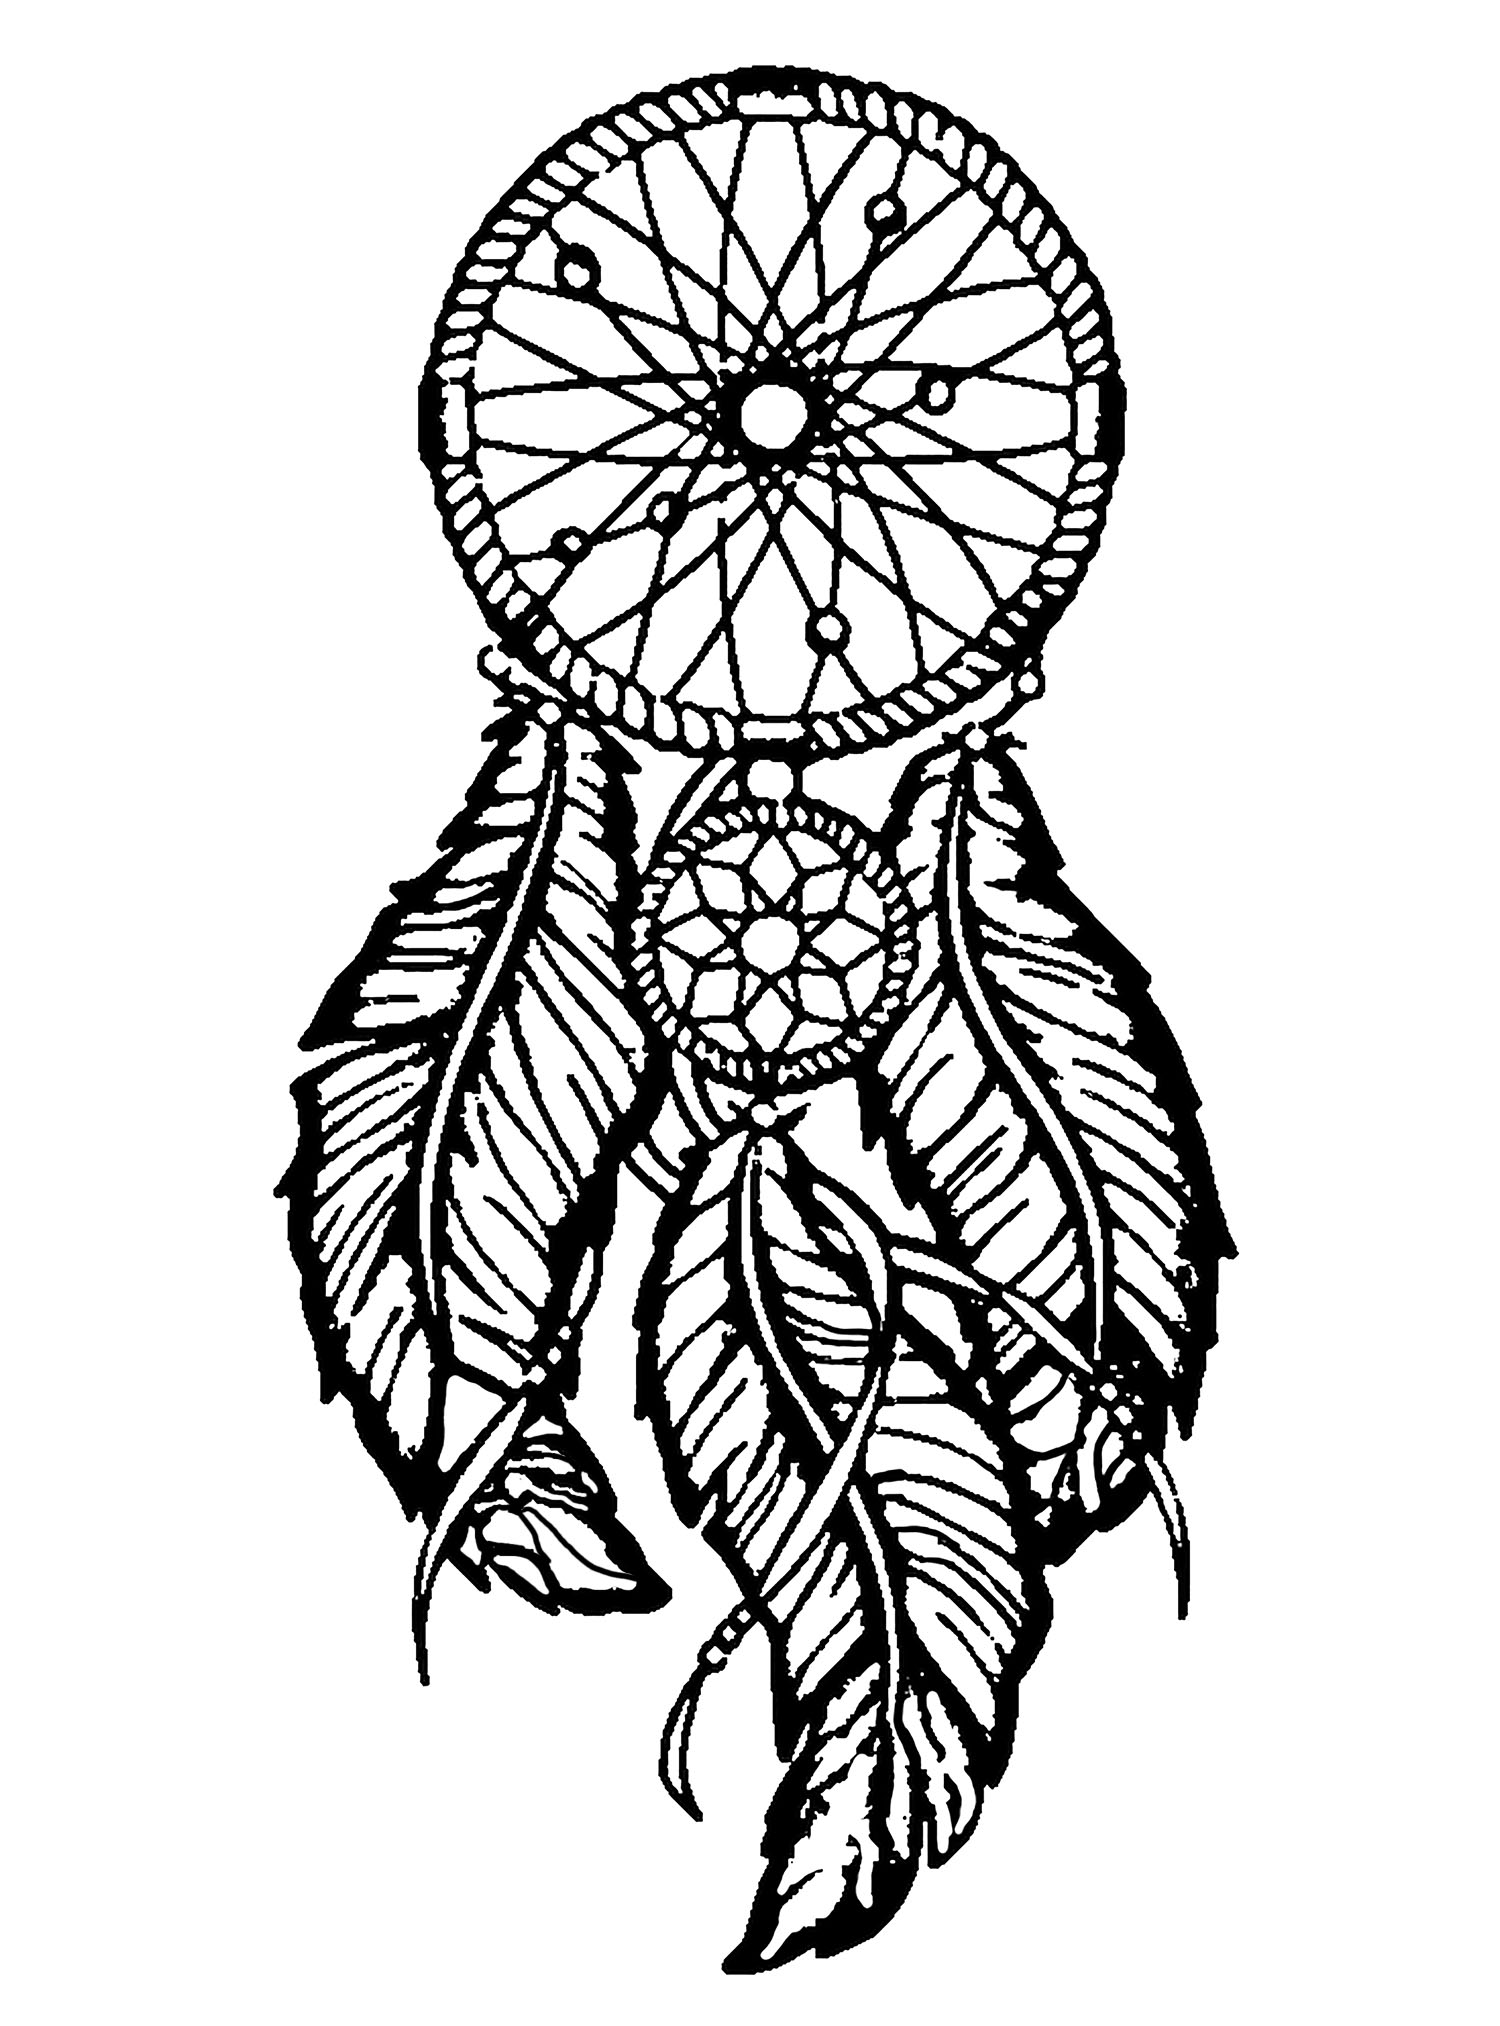 Dreamcatcher big feathers - Dreamcatchers Adult Coloring Pages